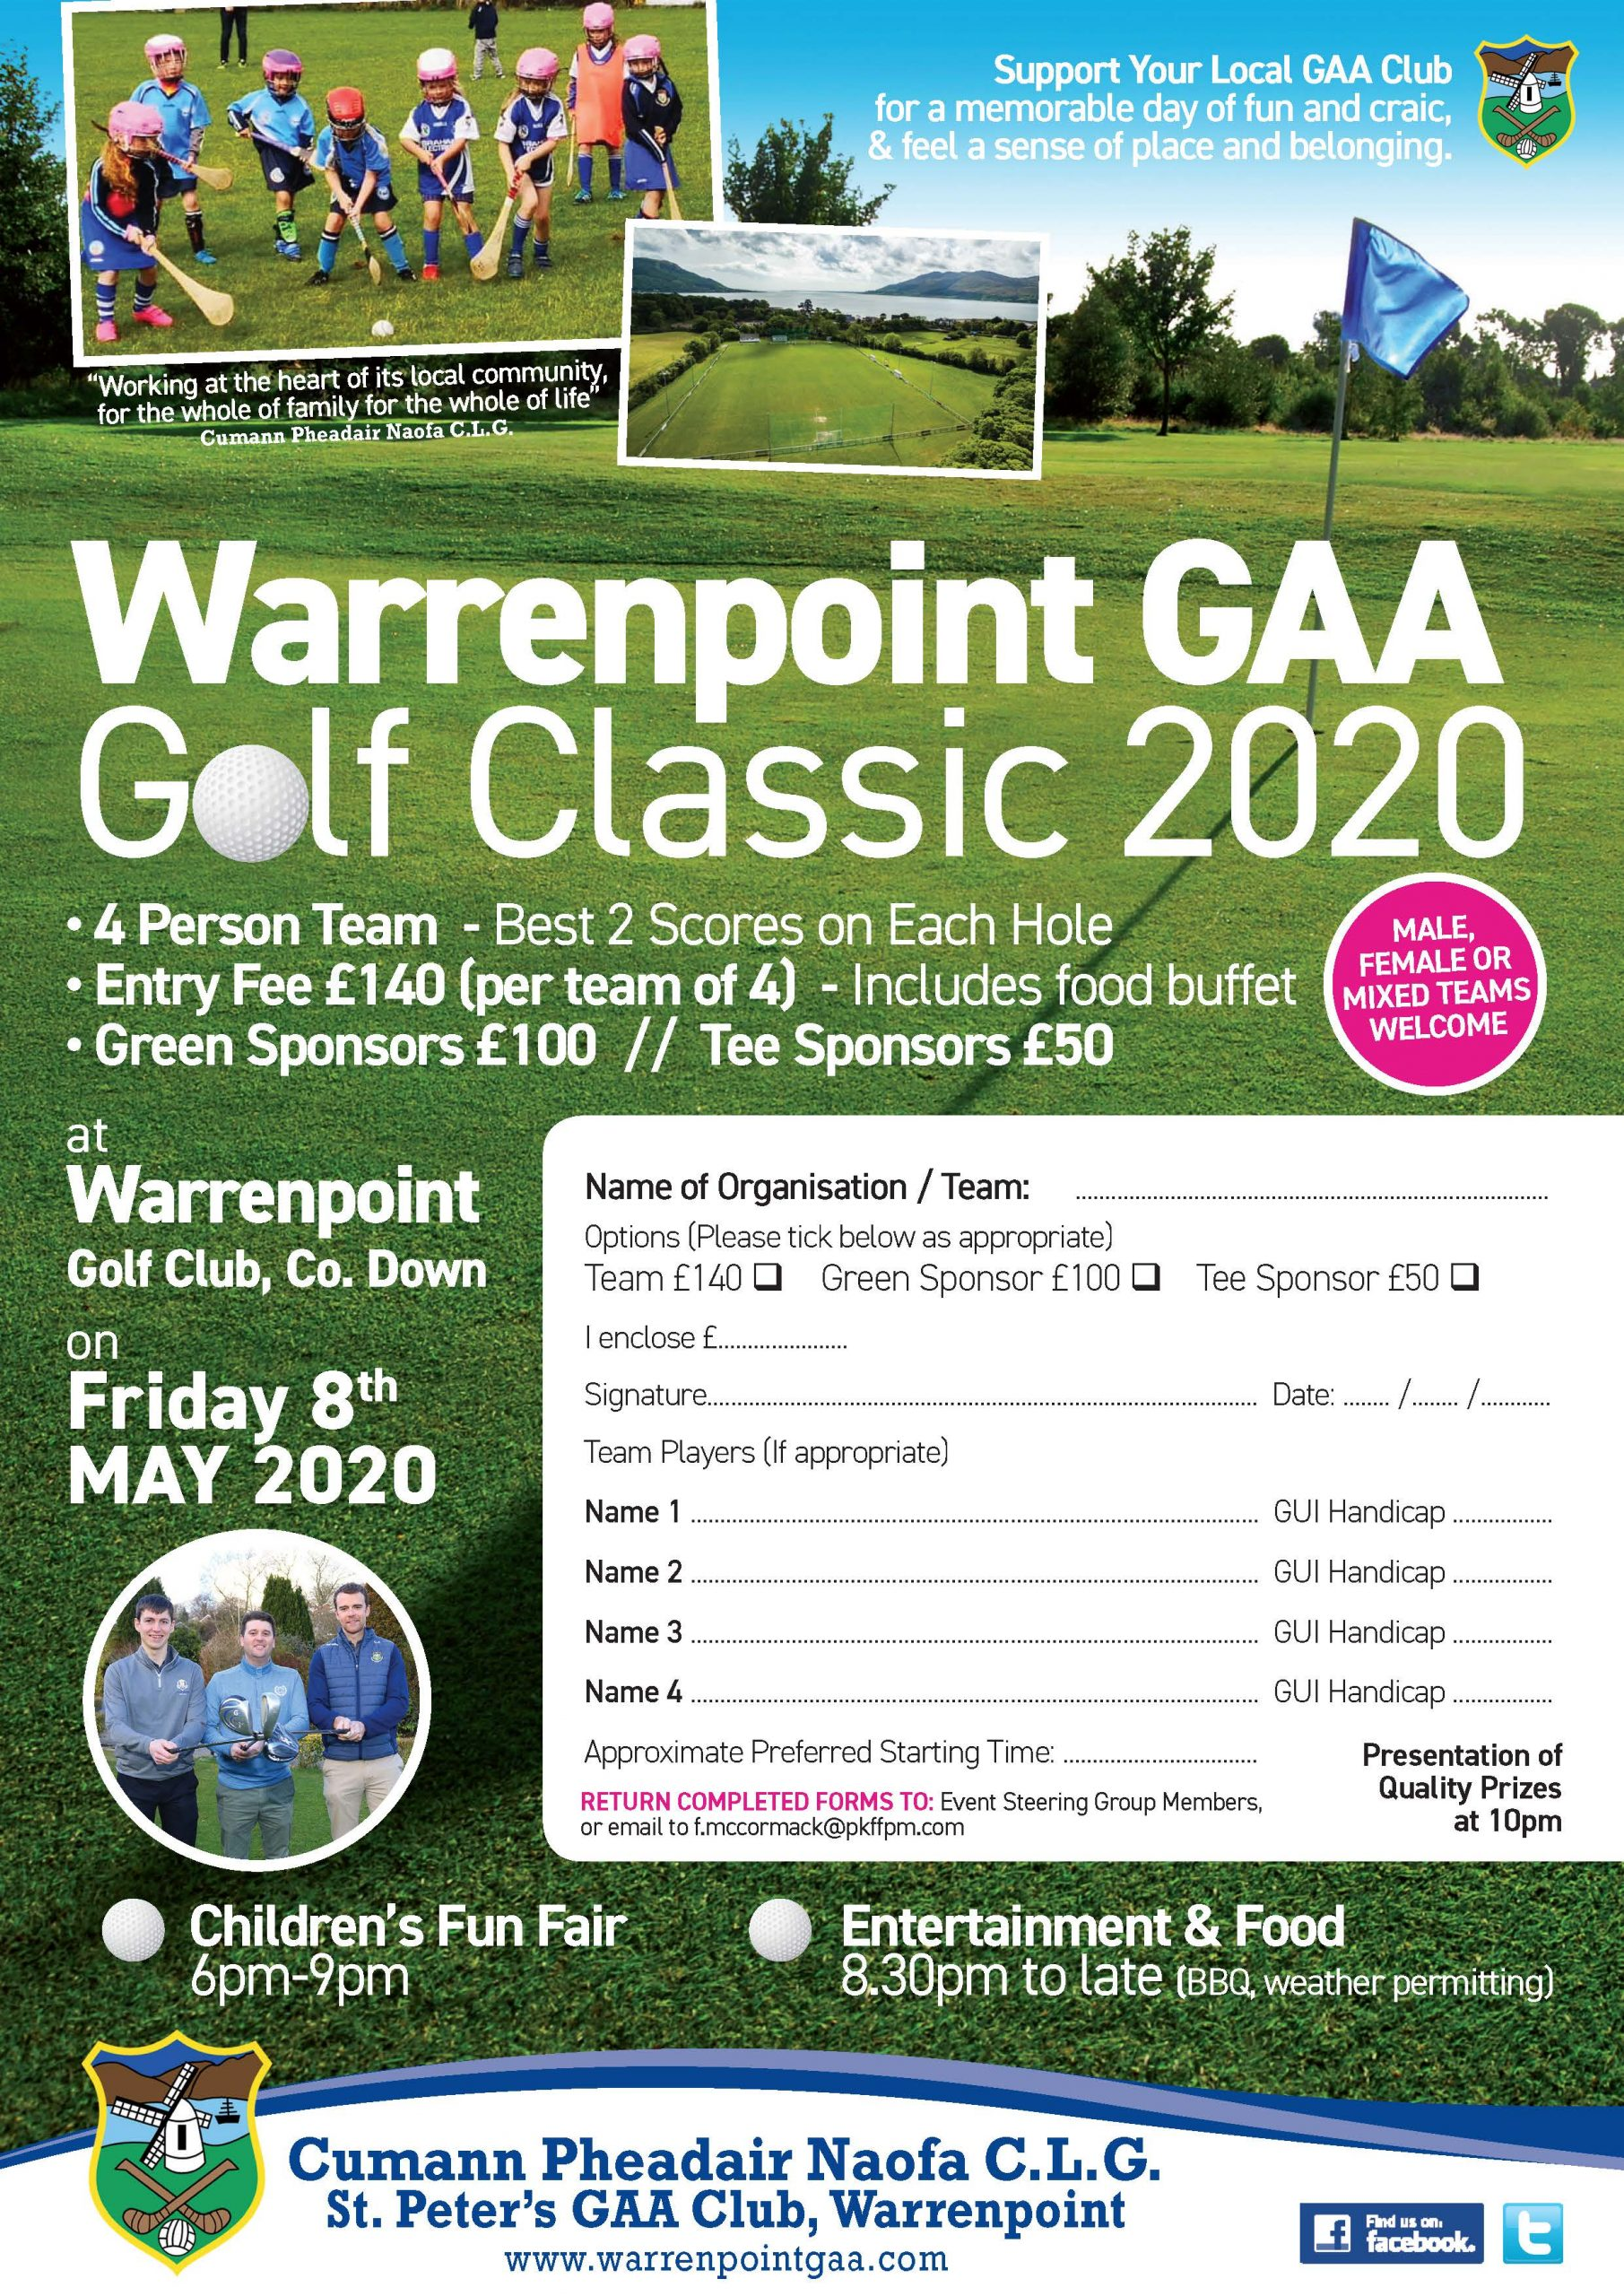 Warrenpoint GAA Golf Classic 2020